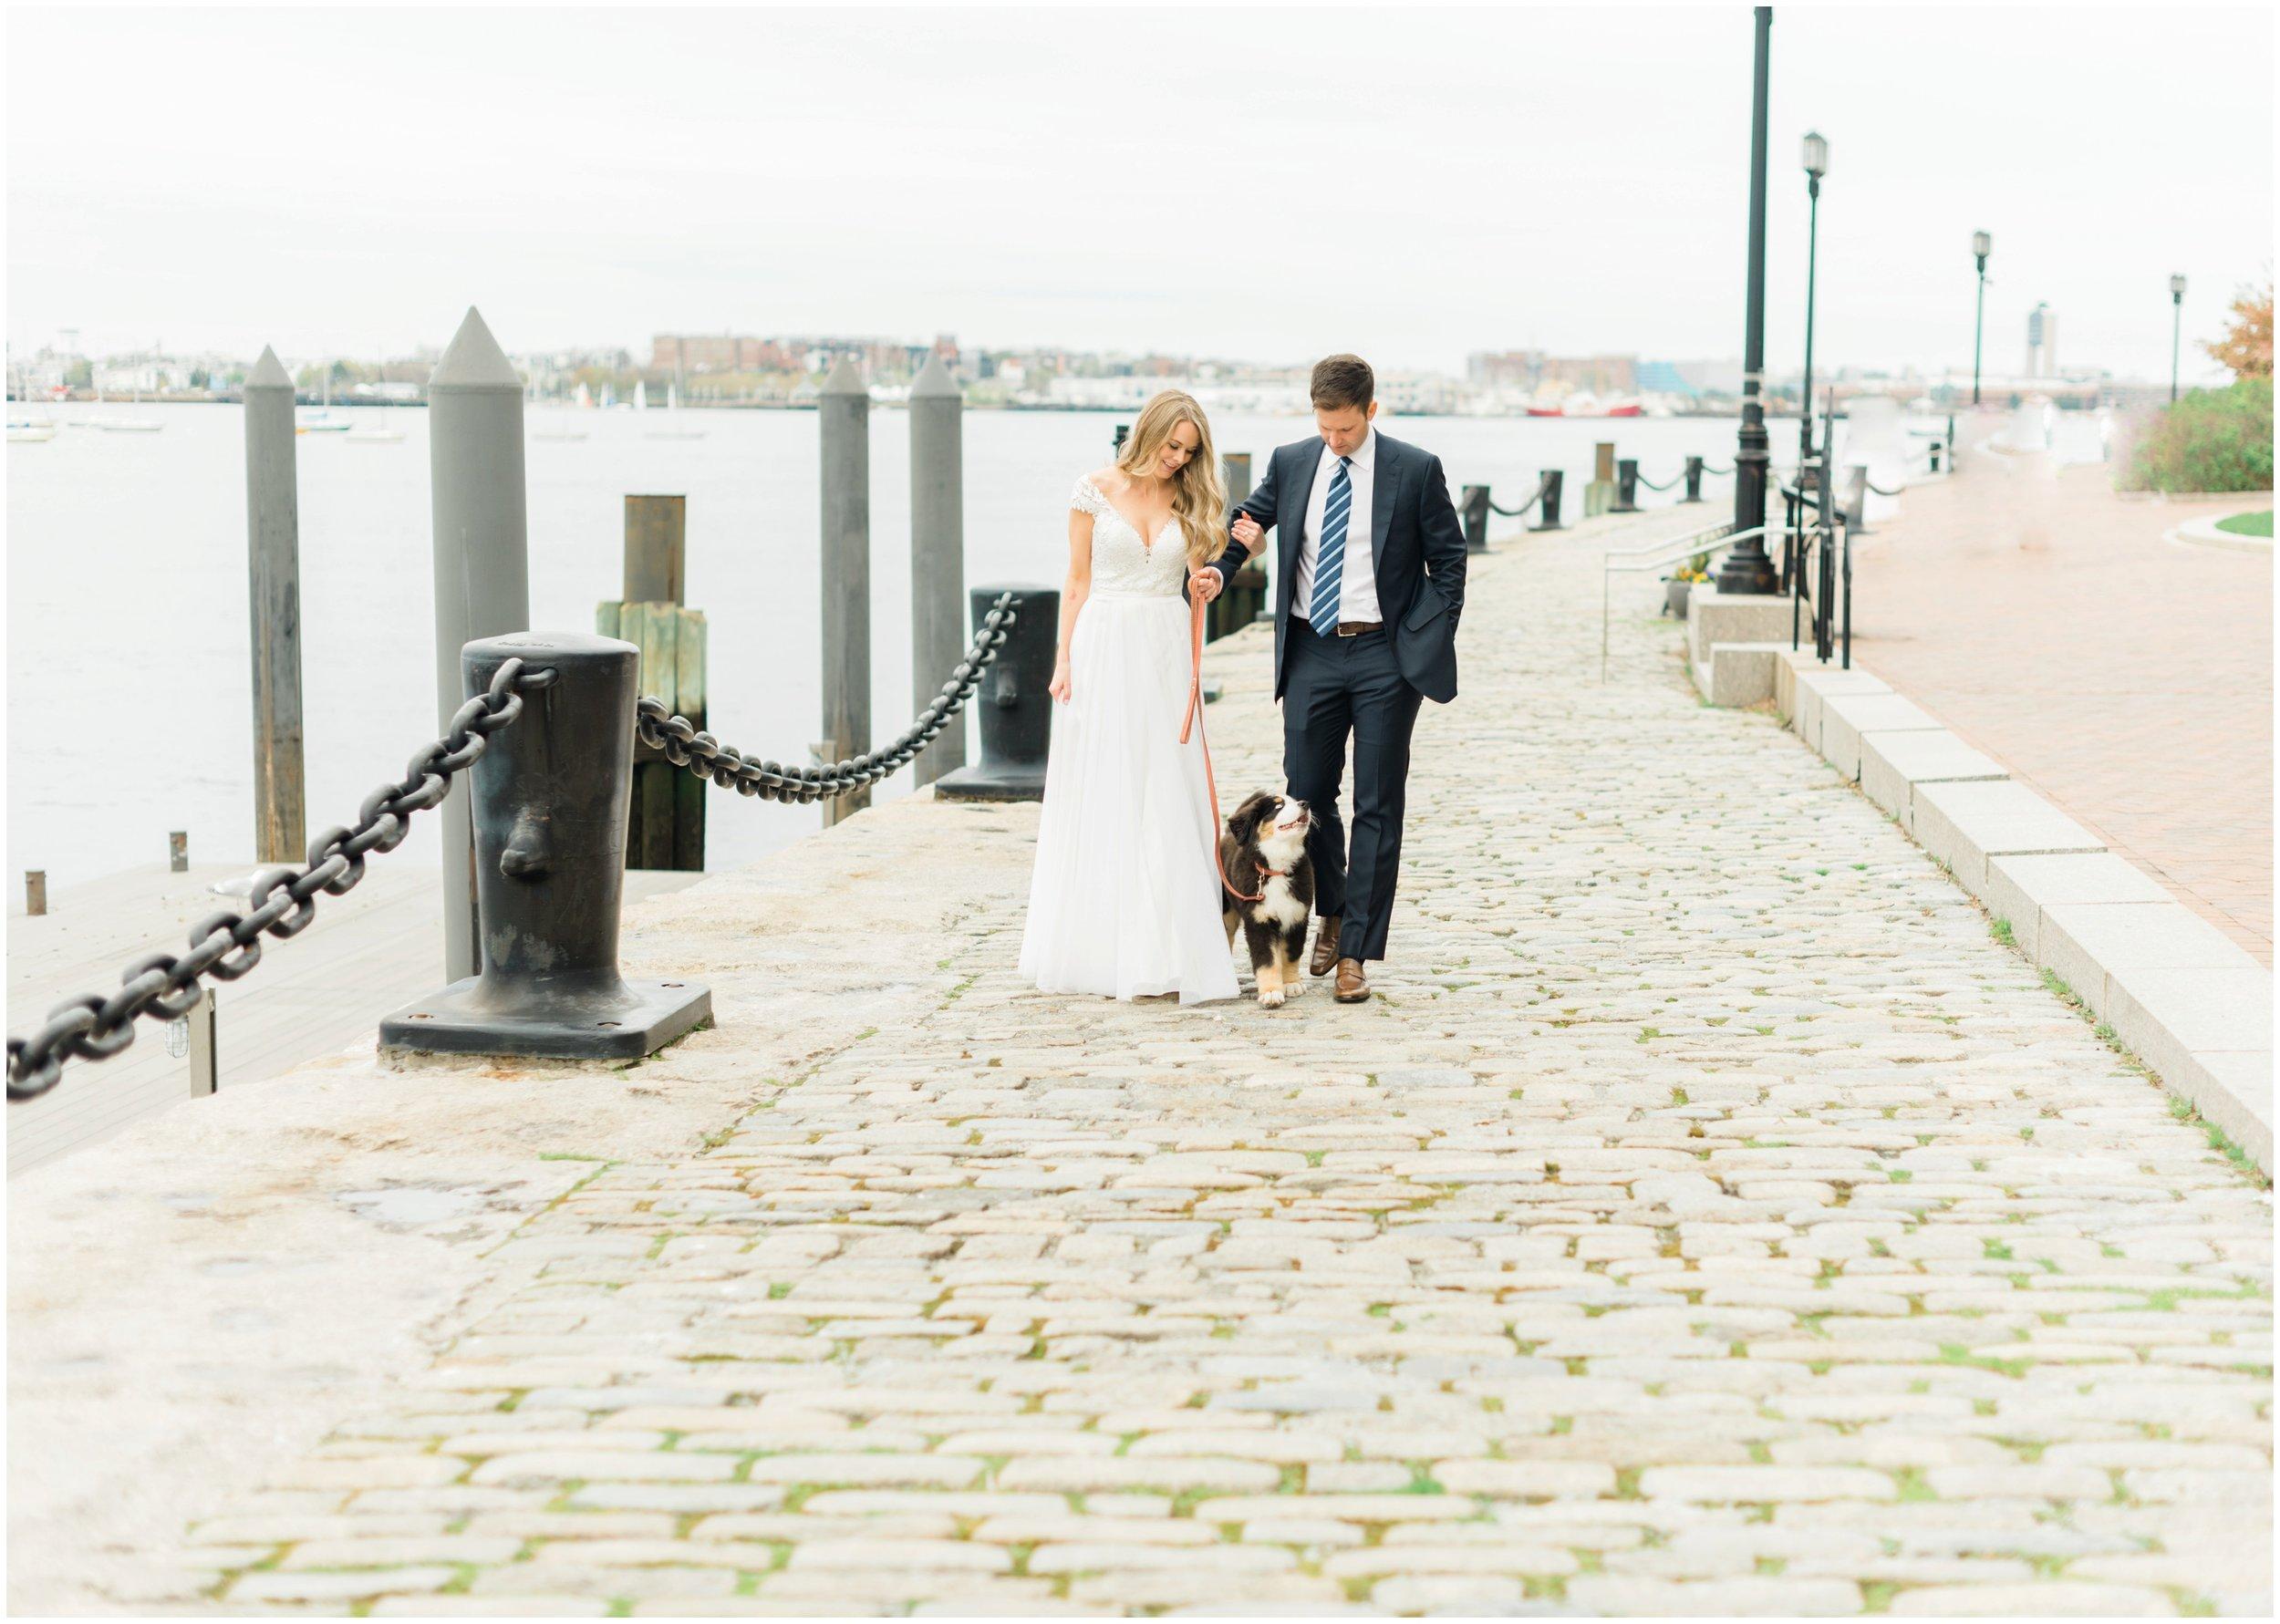 jay-robin-married-row-34-boston-16.jpg